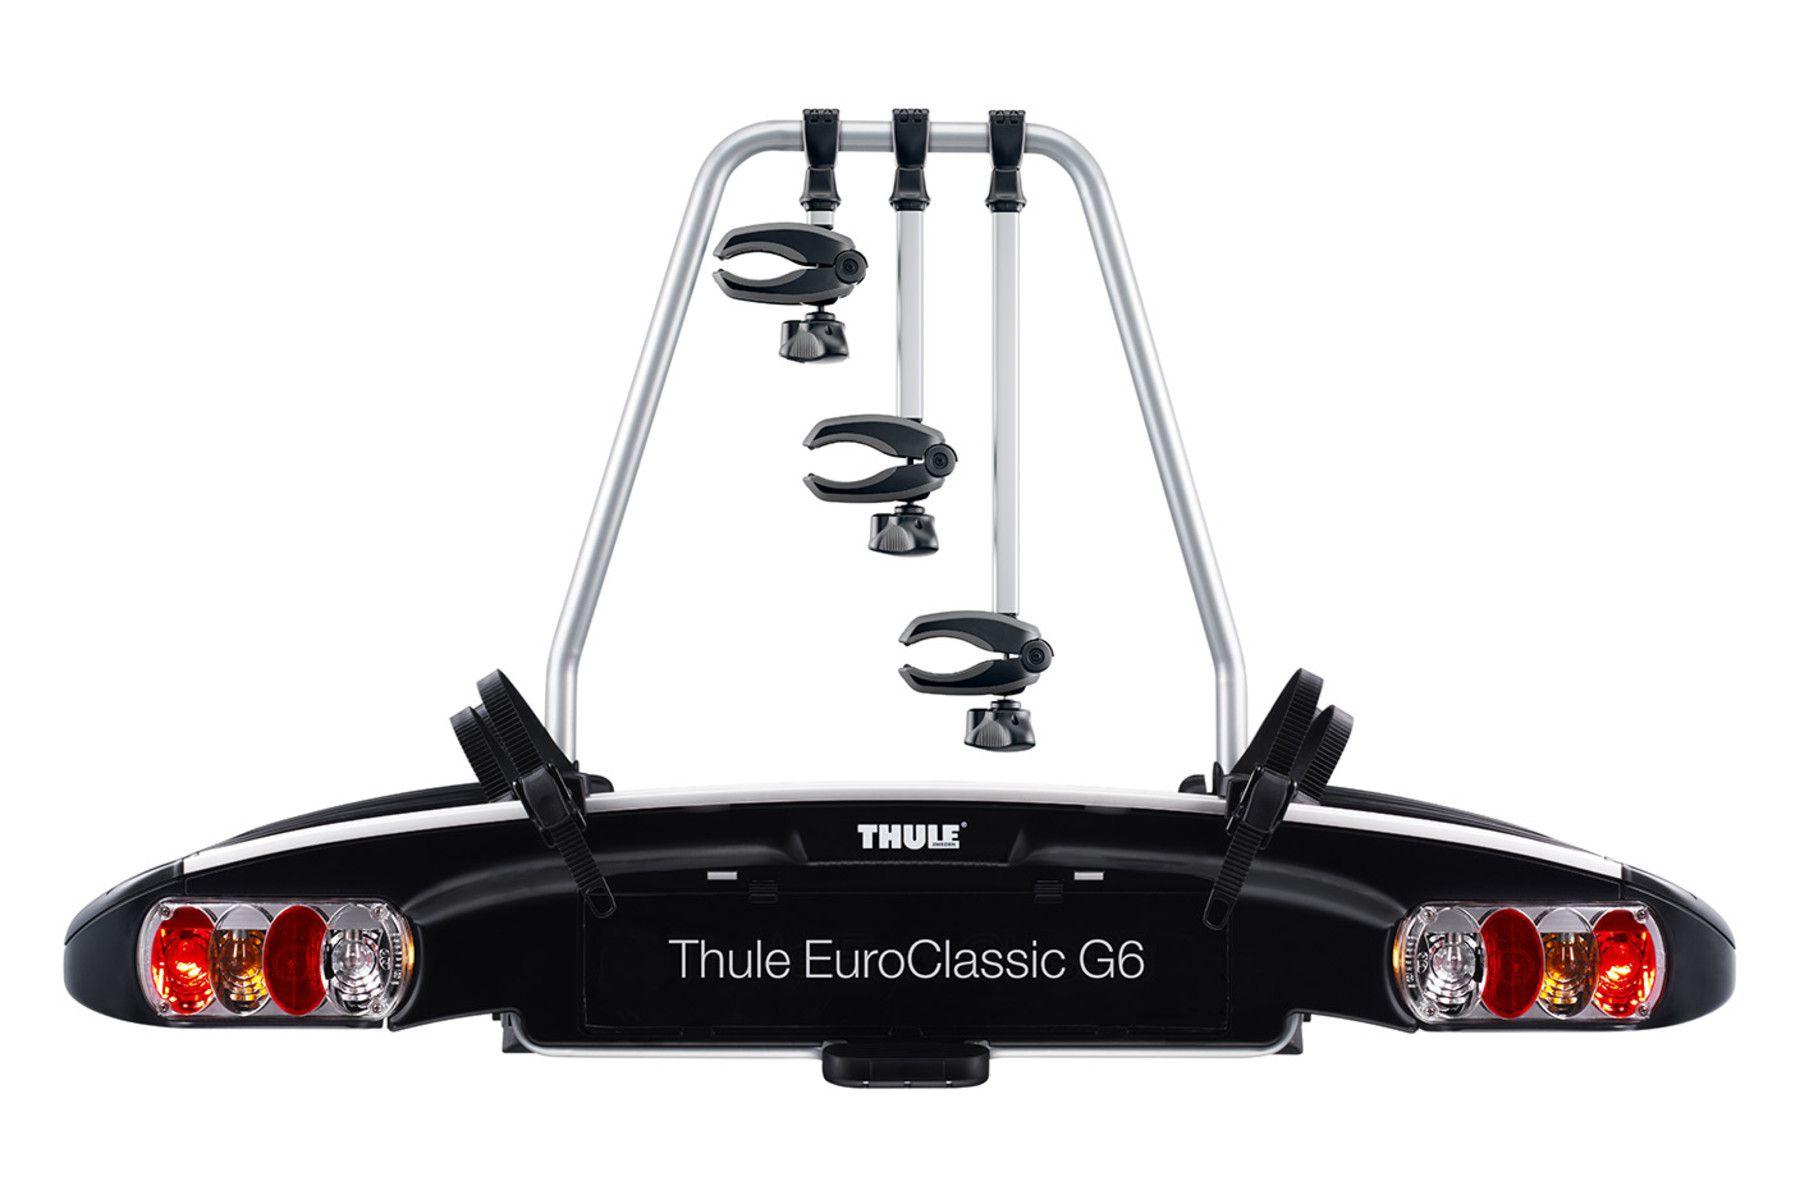 Thule EuroClassic G6 3